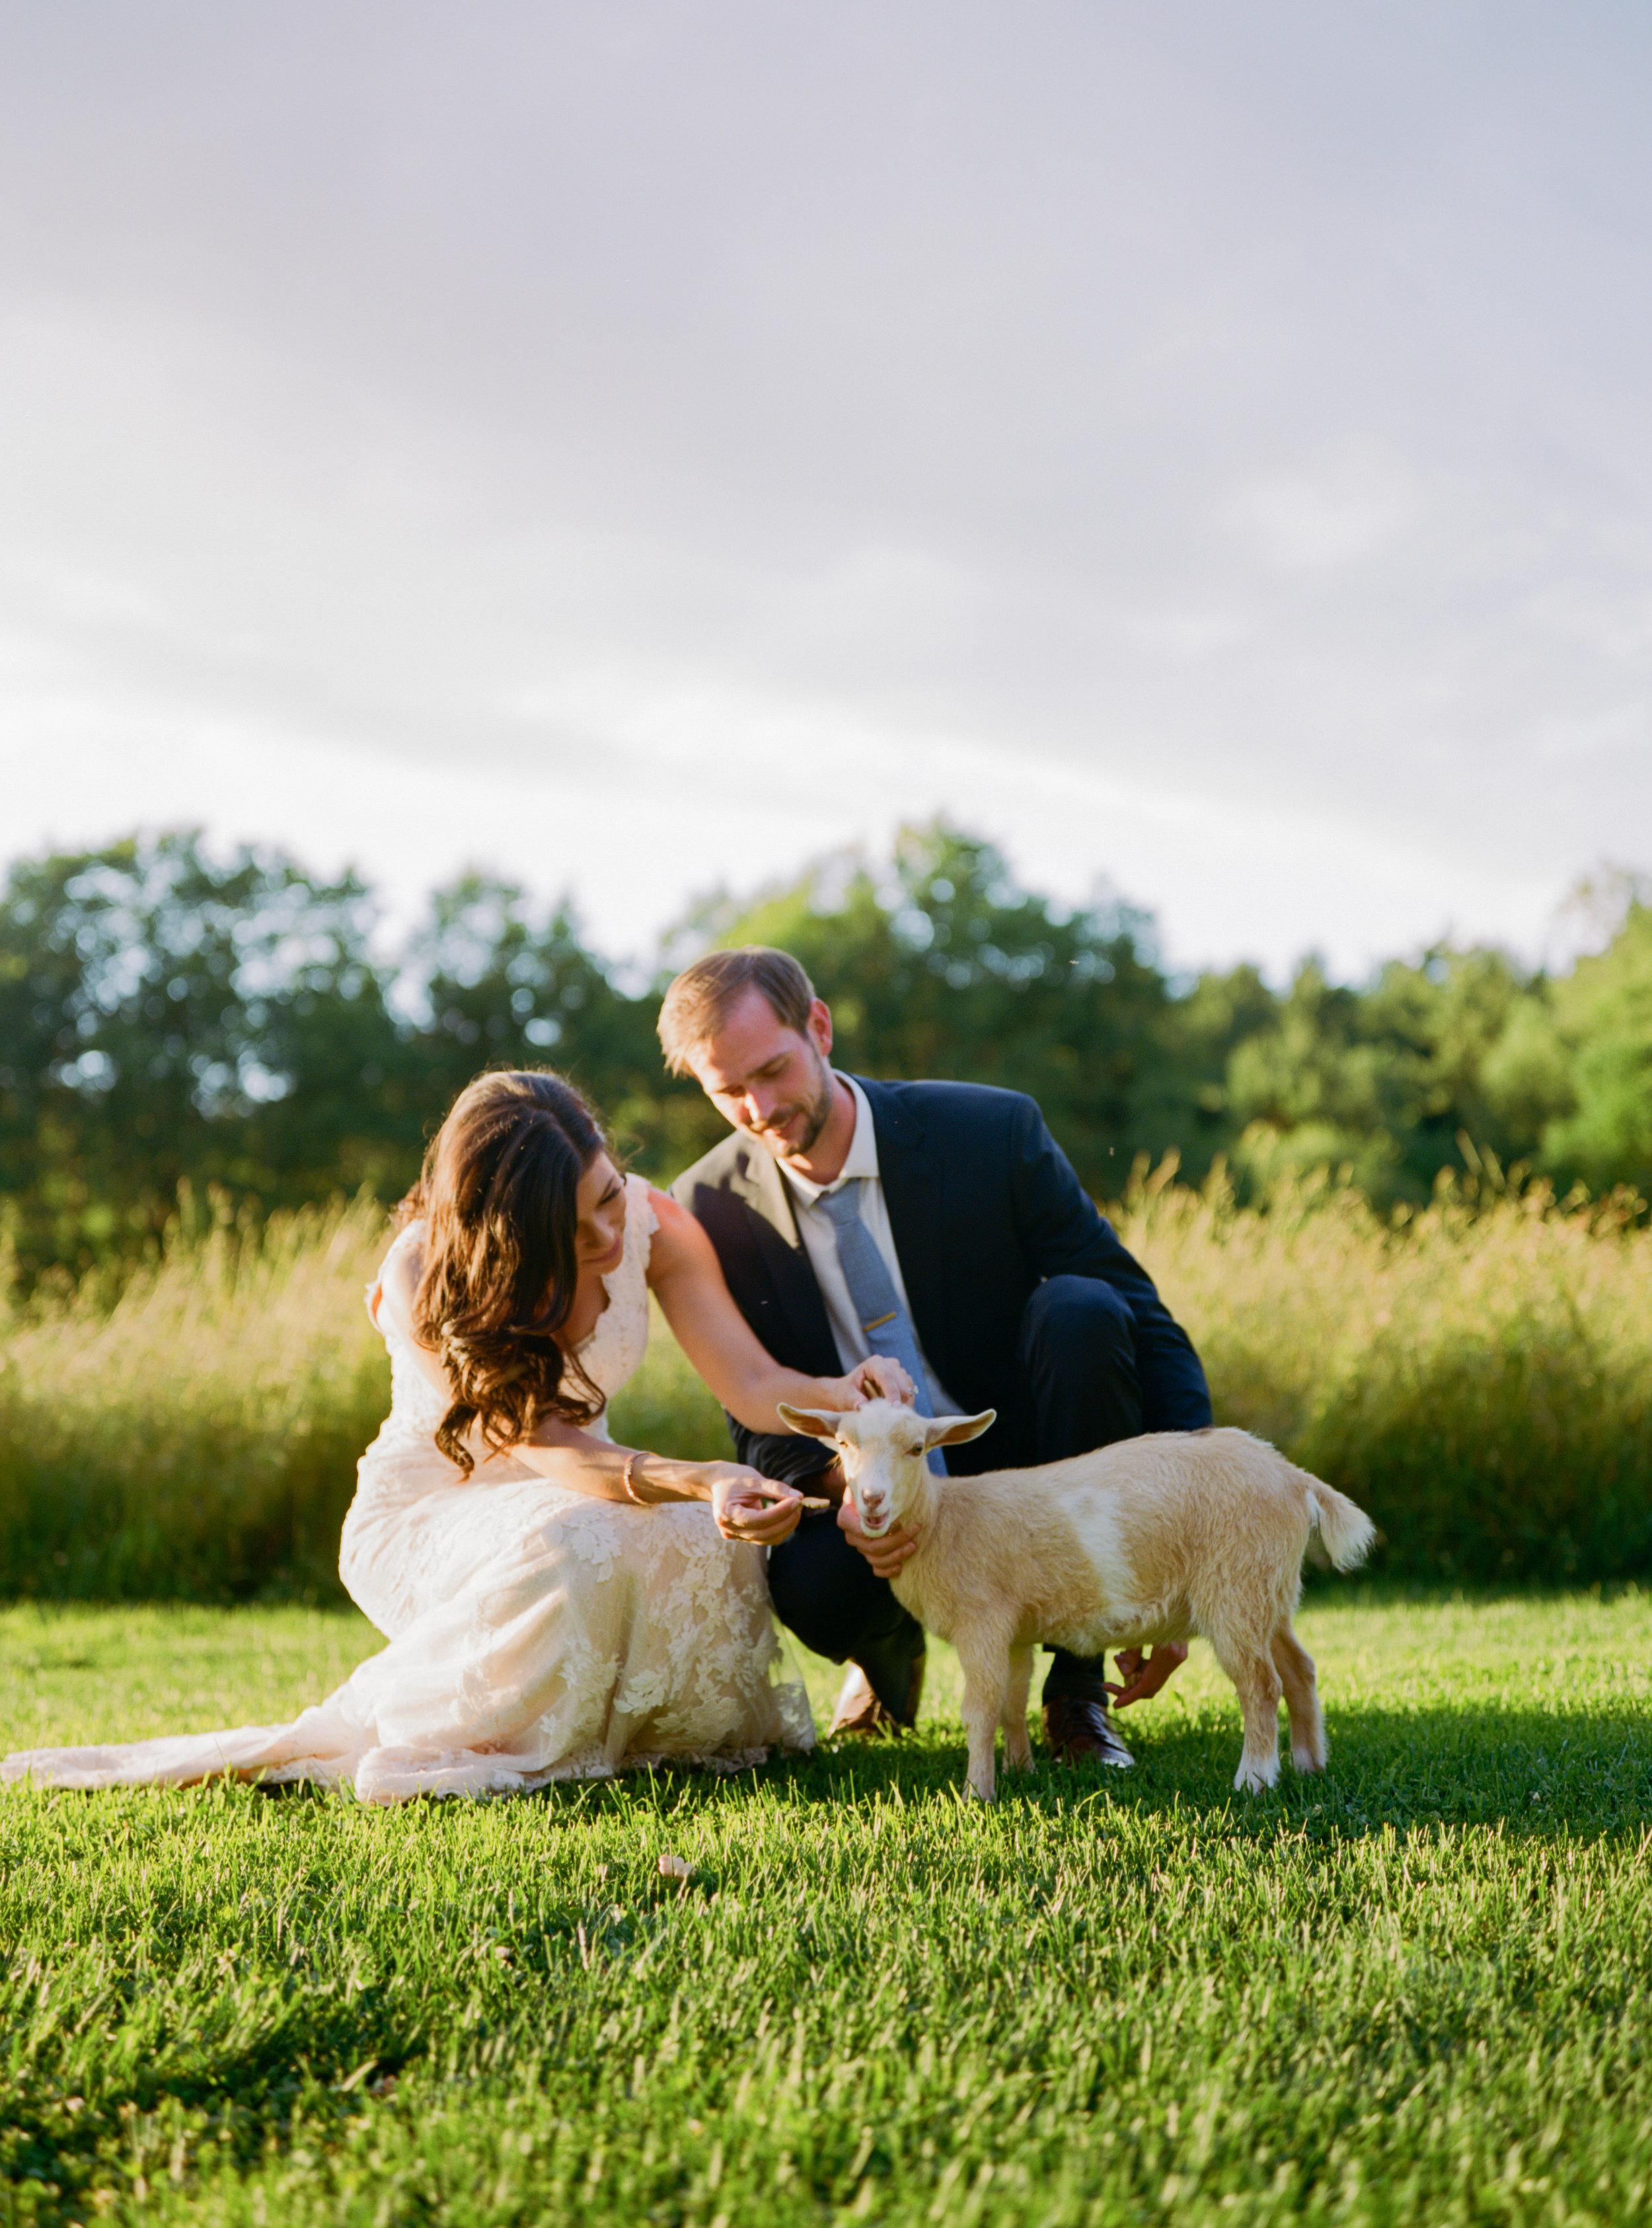 claudia-travis-upstate-farm-wedding-gilbertsvile-farmhouse-meadowlark-stills-lawrence-braun-FILM-0217.jpg